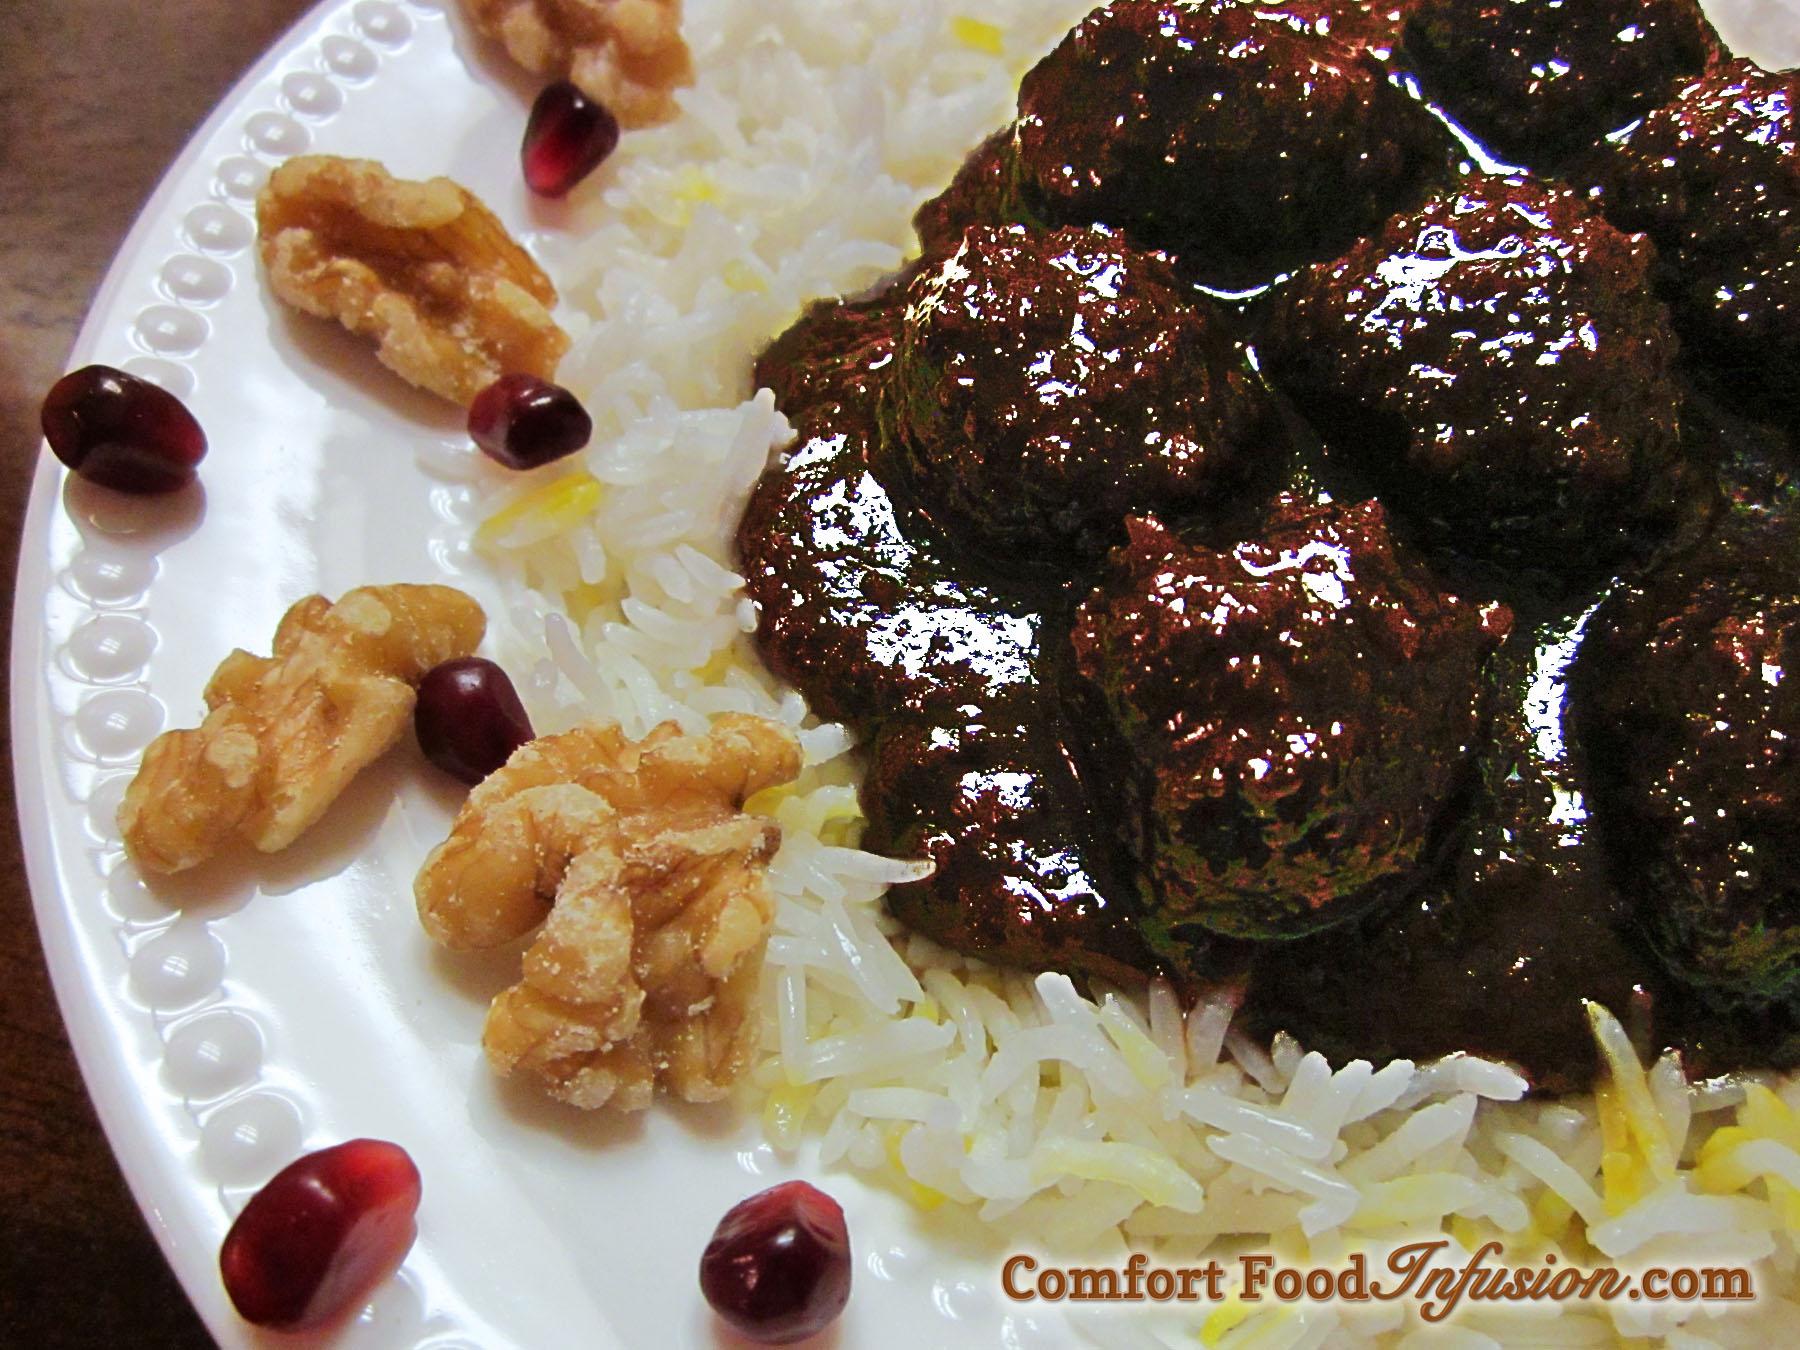 Pomegranate Walnut and Meatball Stew